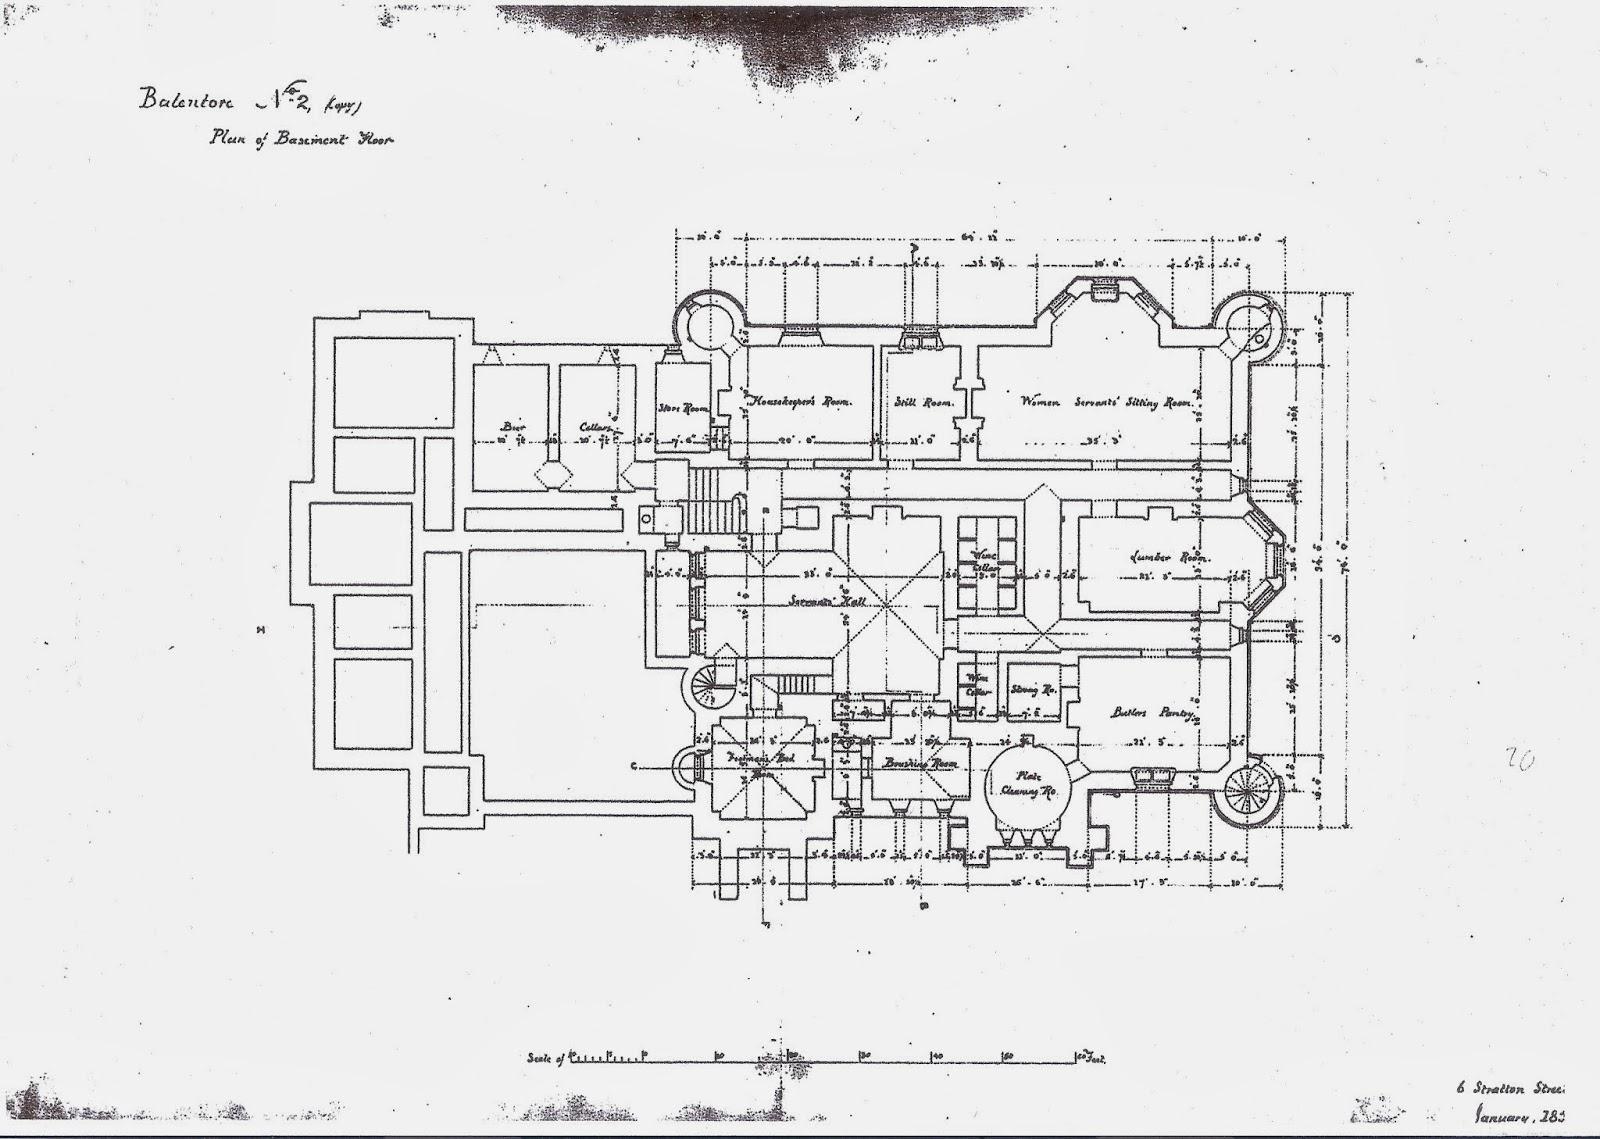 balintore castle restoration project november 2013 plan 2 basement floor